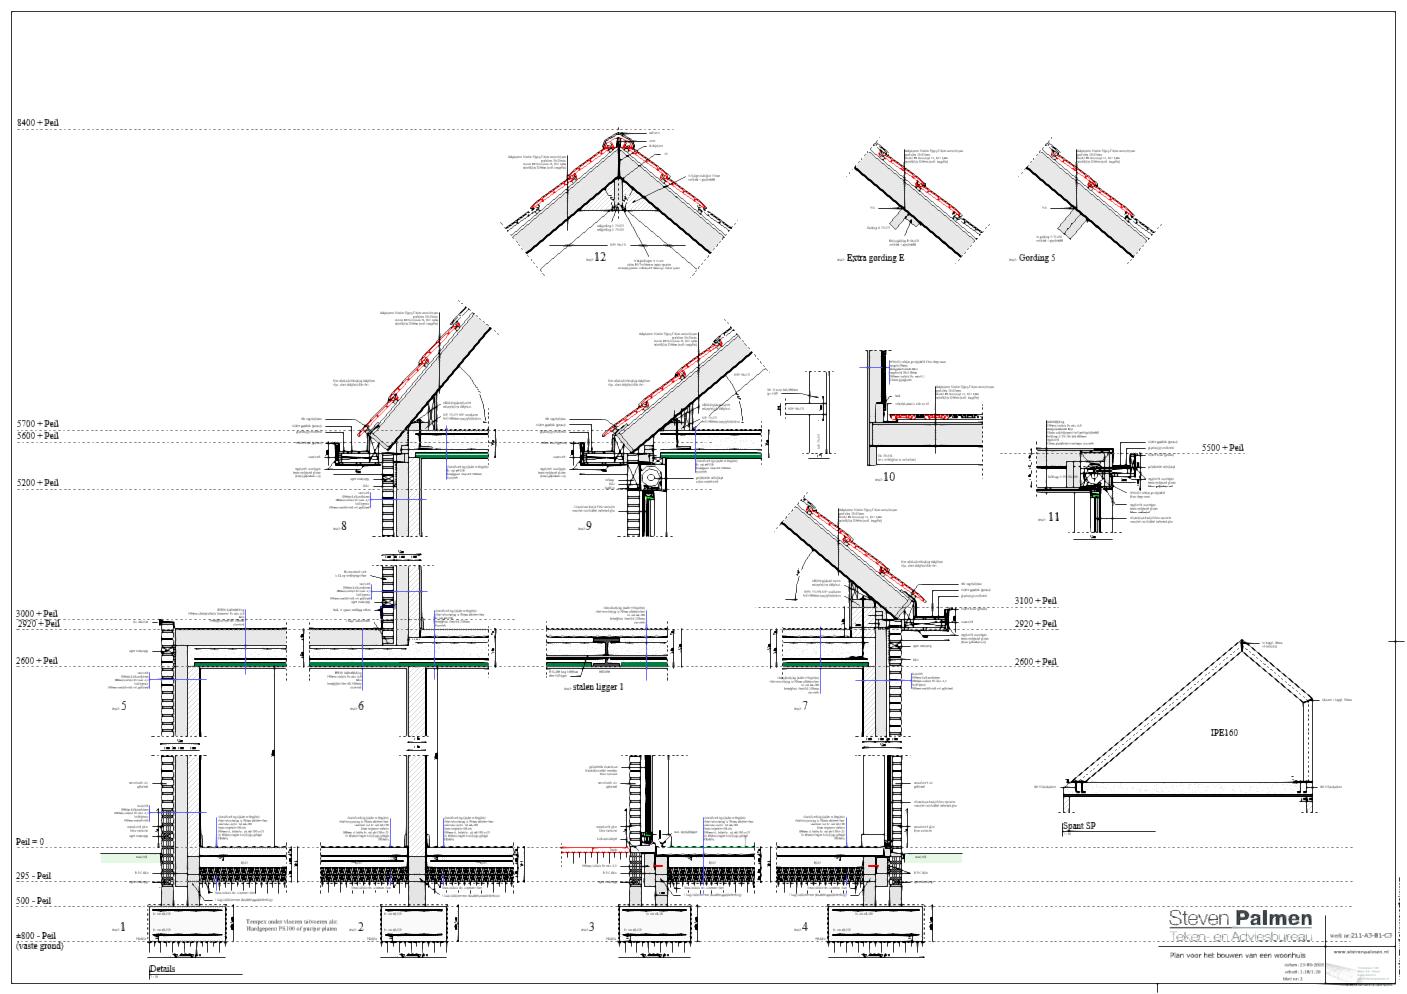 Steven Palmen Architect Bouwkundig teken en Adviesbureau